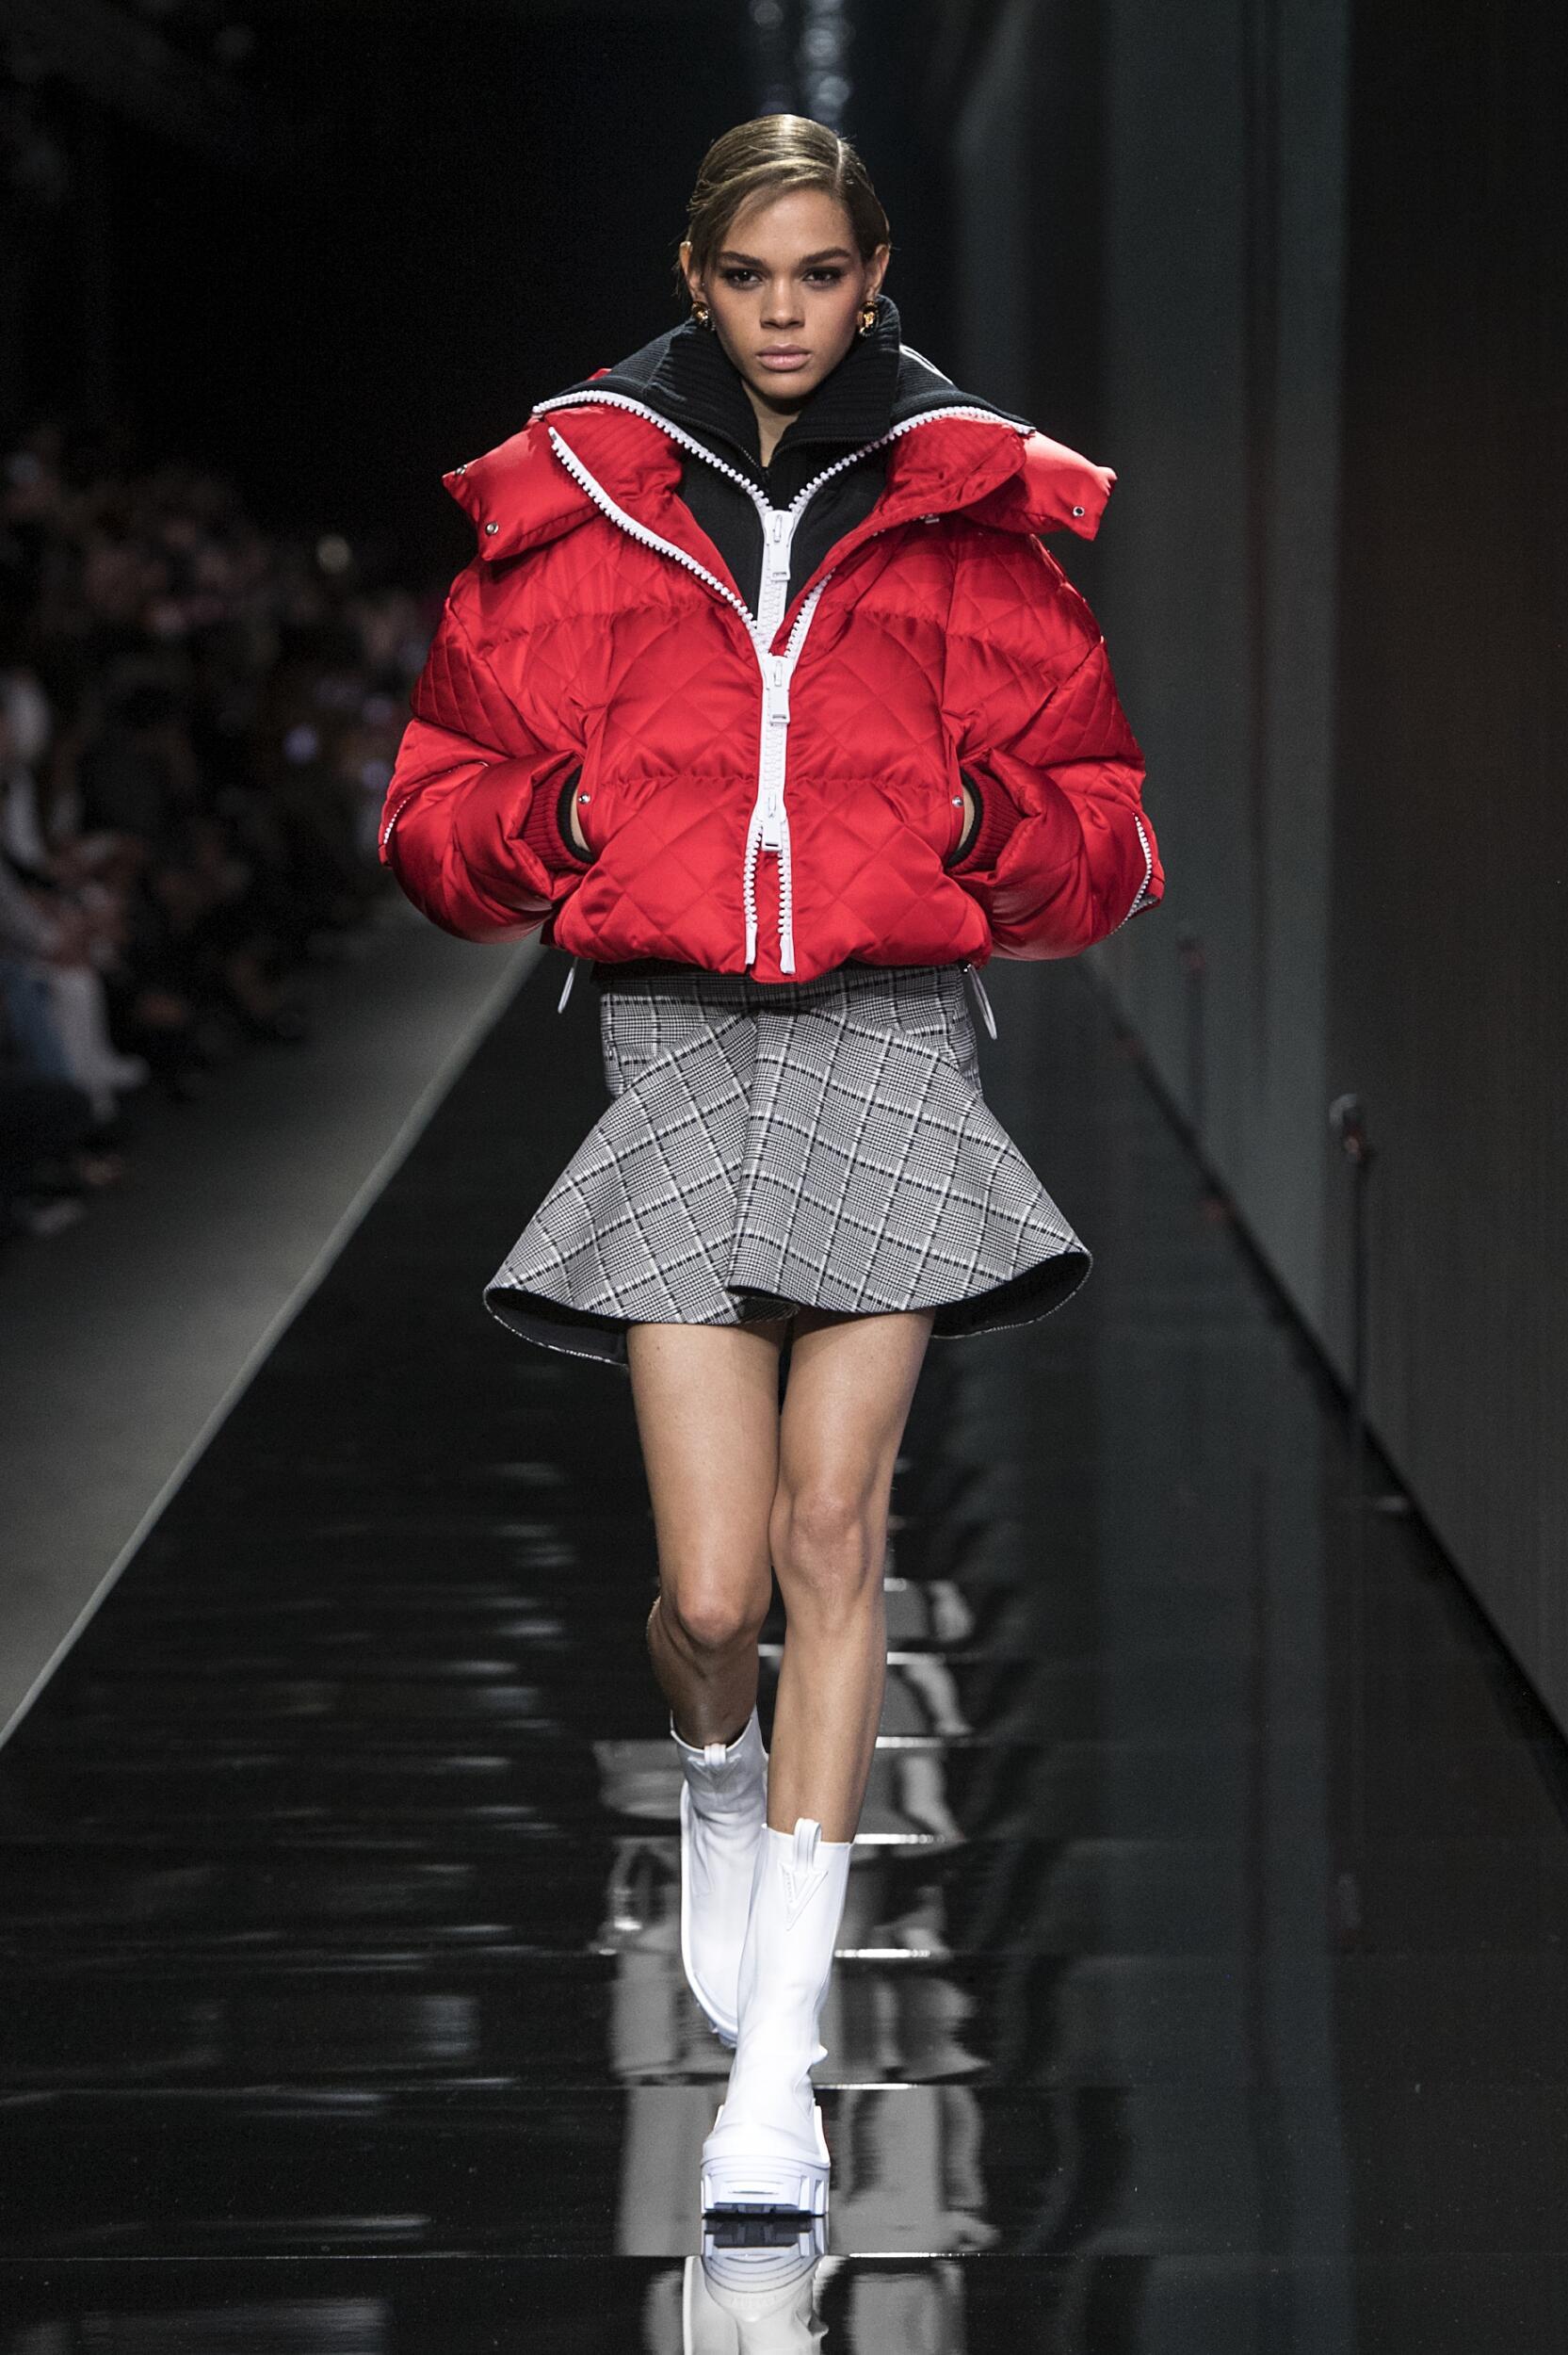 Versace Winter 2020 Catwalk